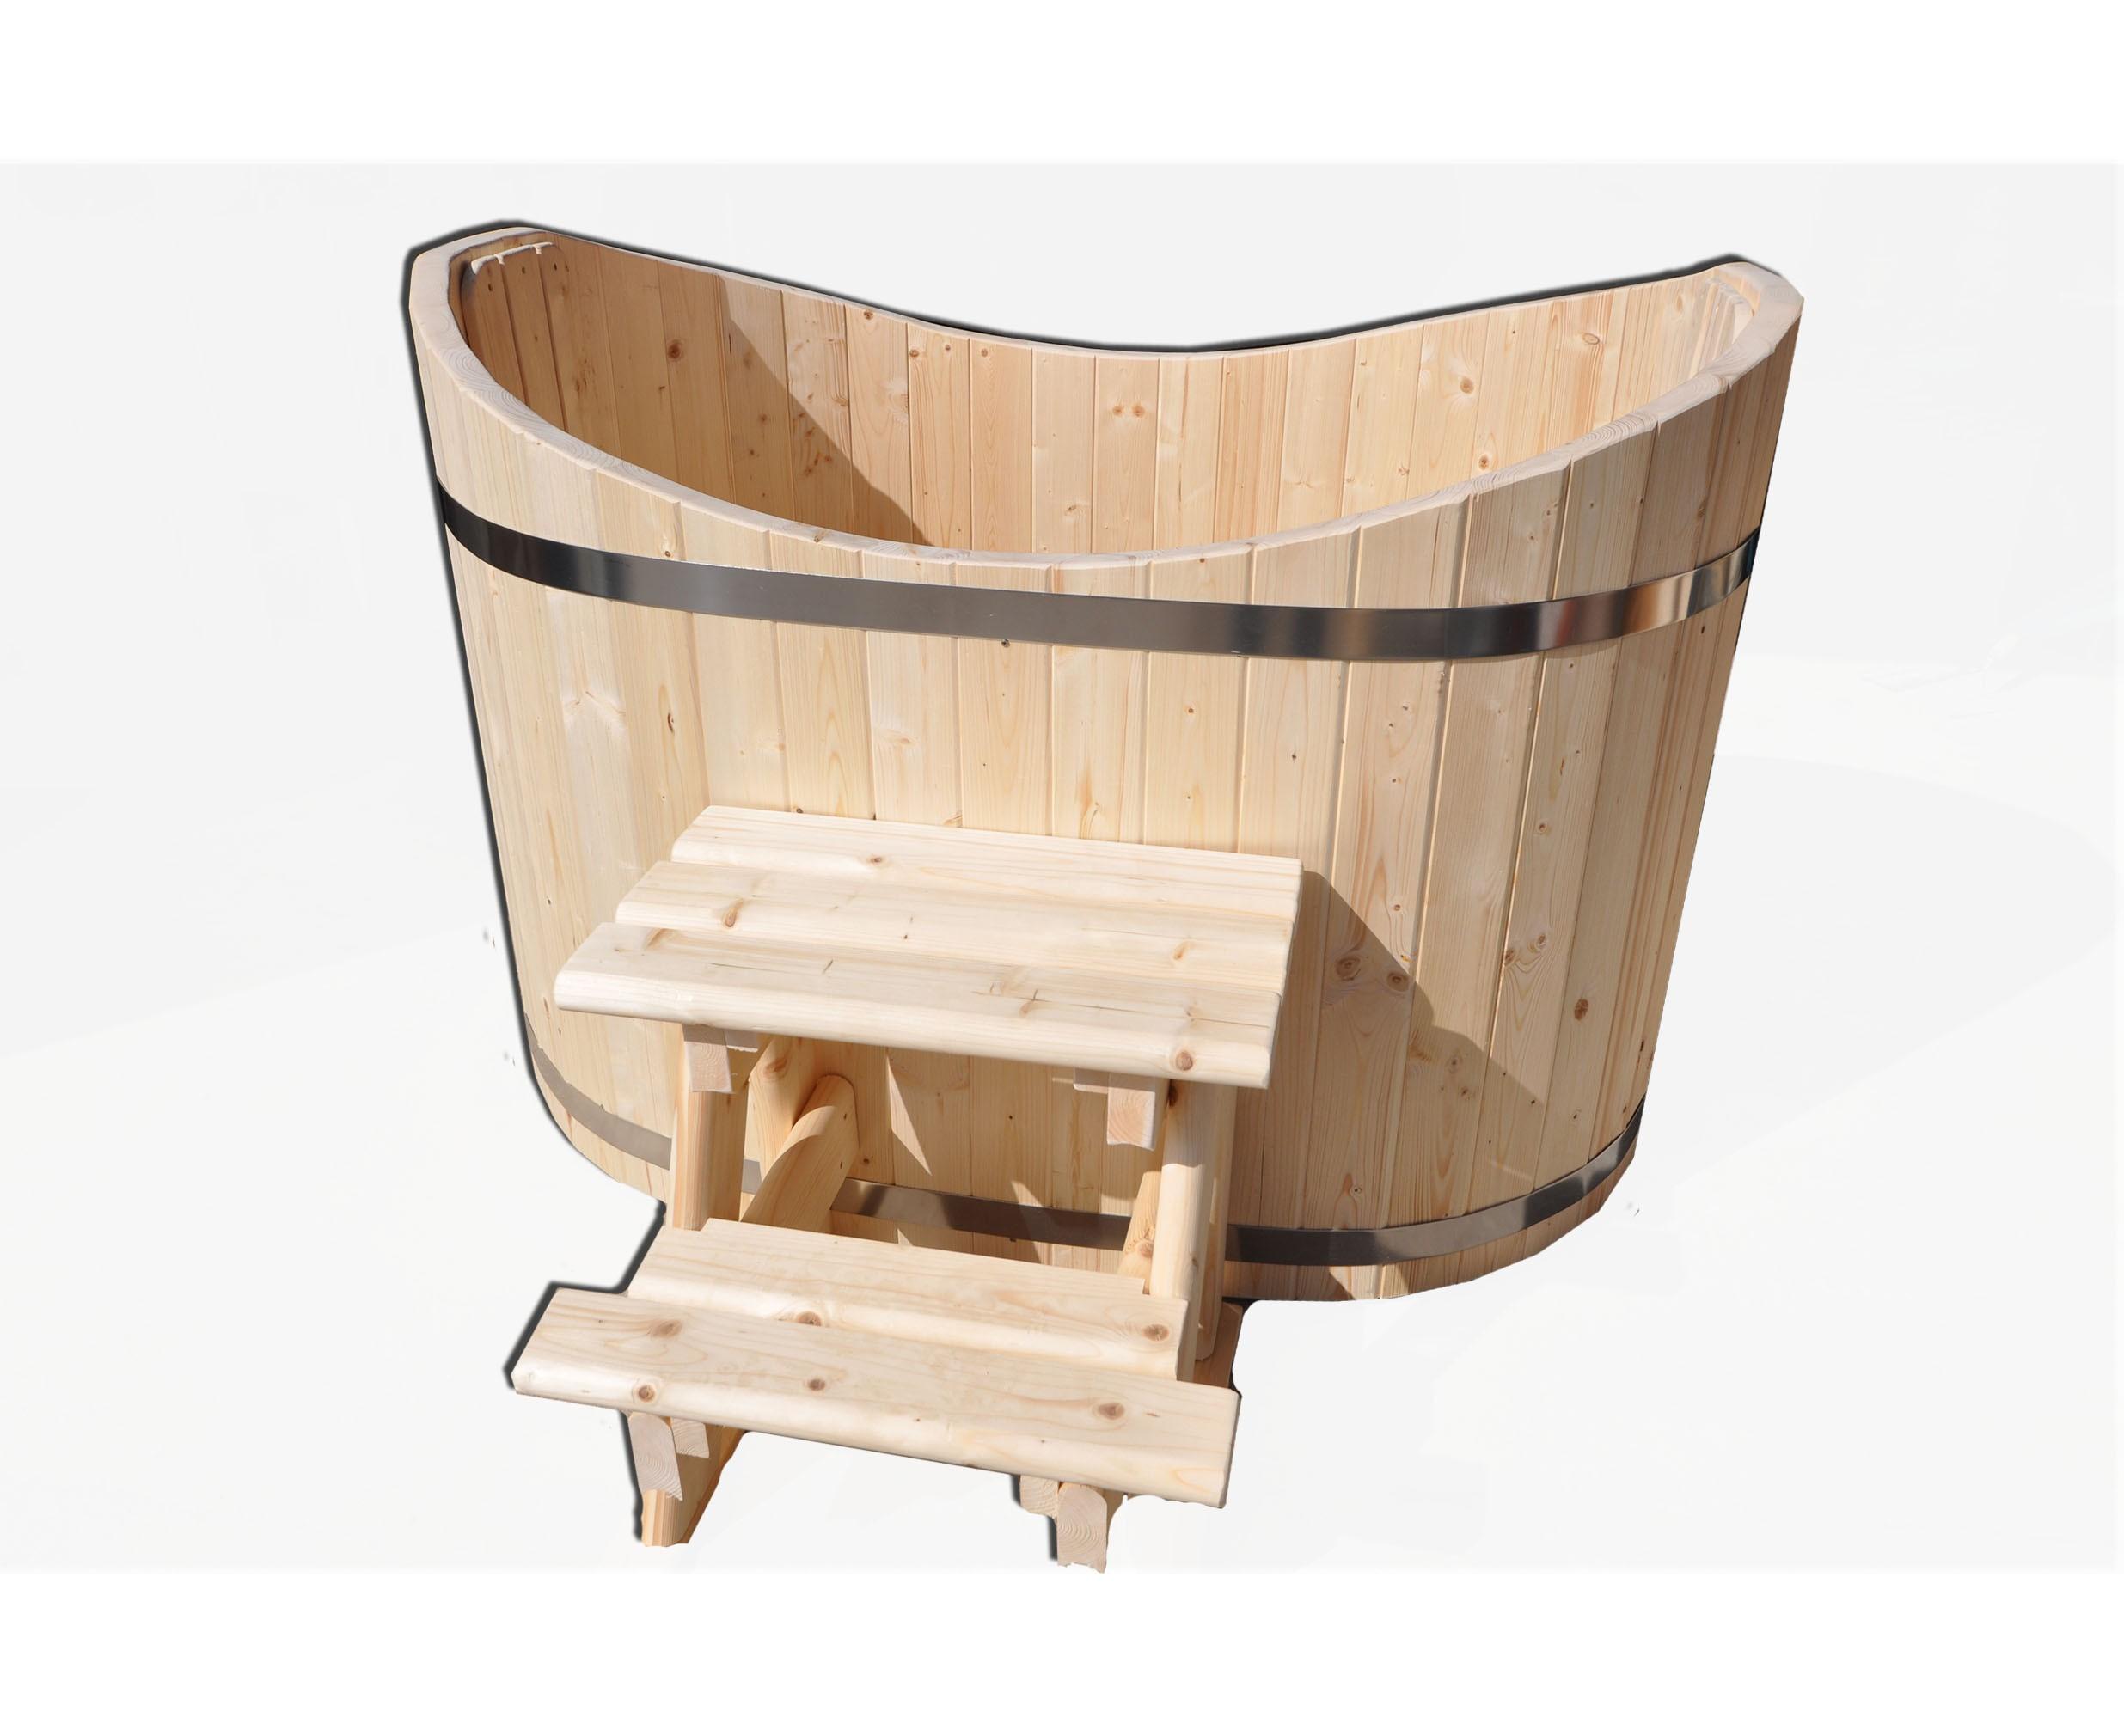 vasca da bagno rotonda vasche da bagno gruppo treesse. Black Bedroom Furniture Sets. Home Design Ideas